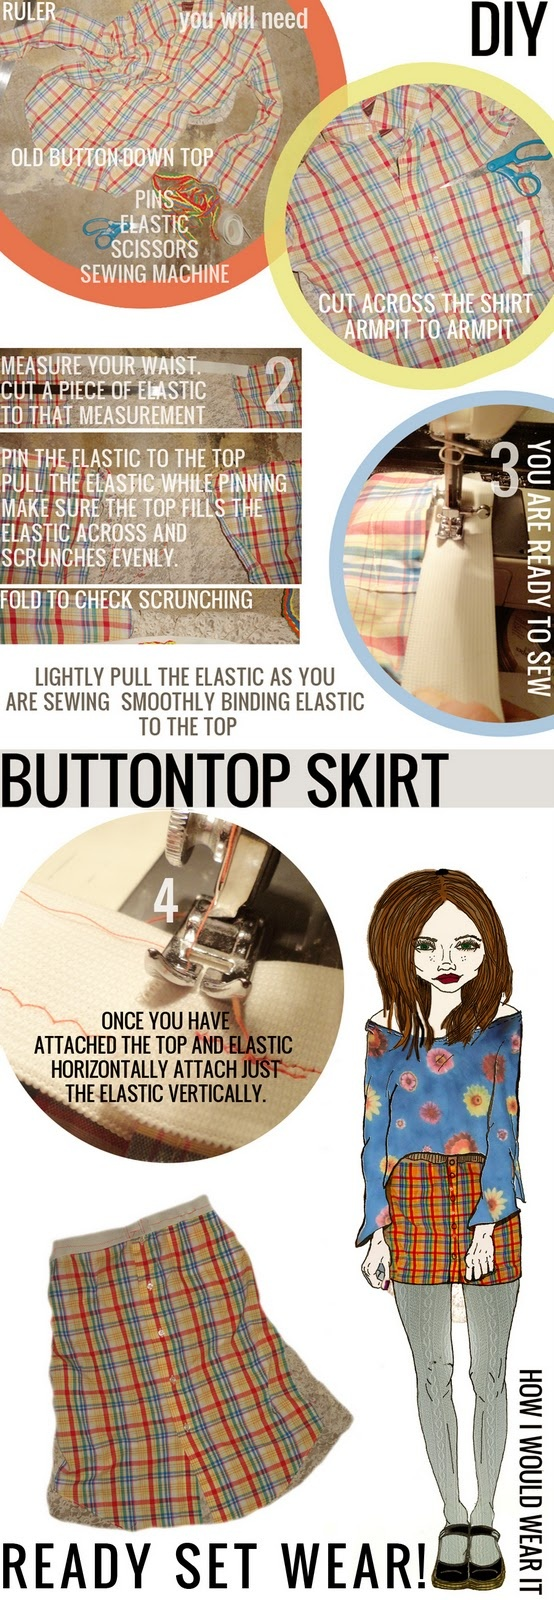 Skirt from Shirt